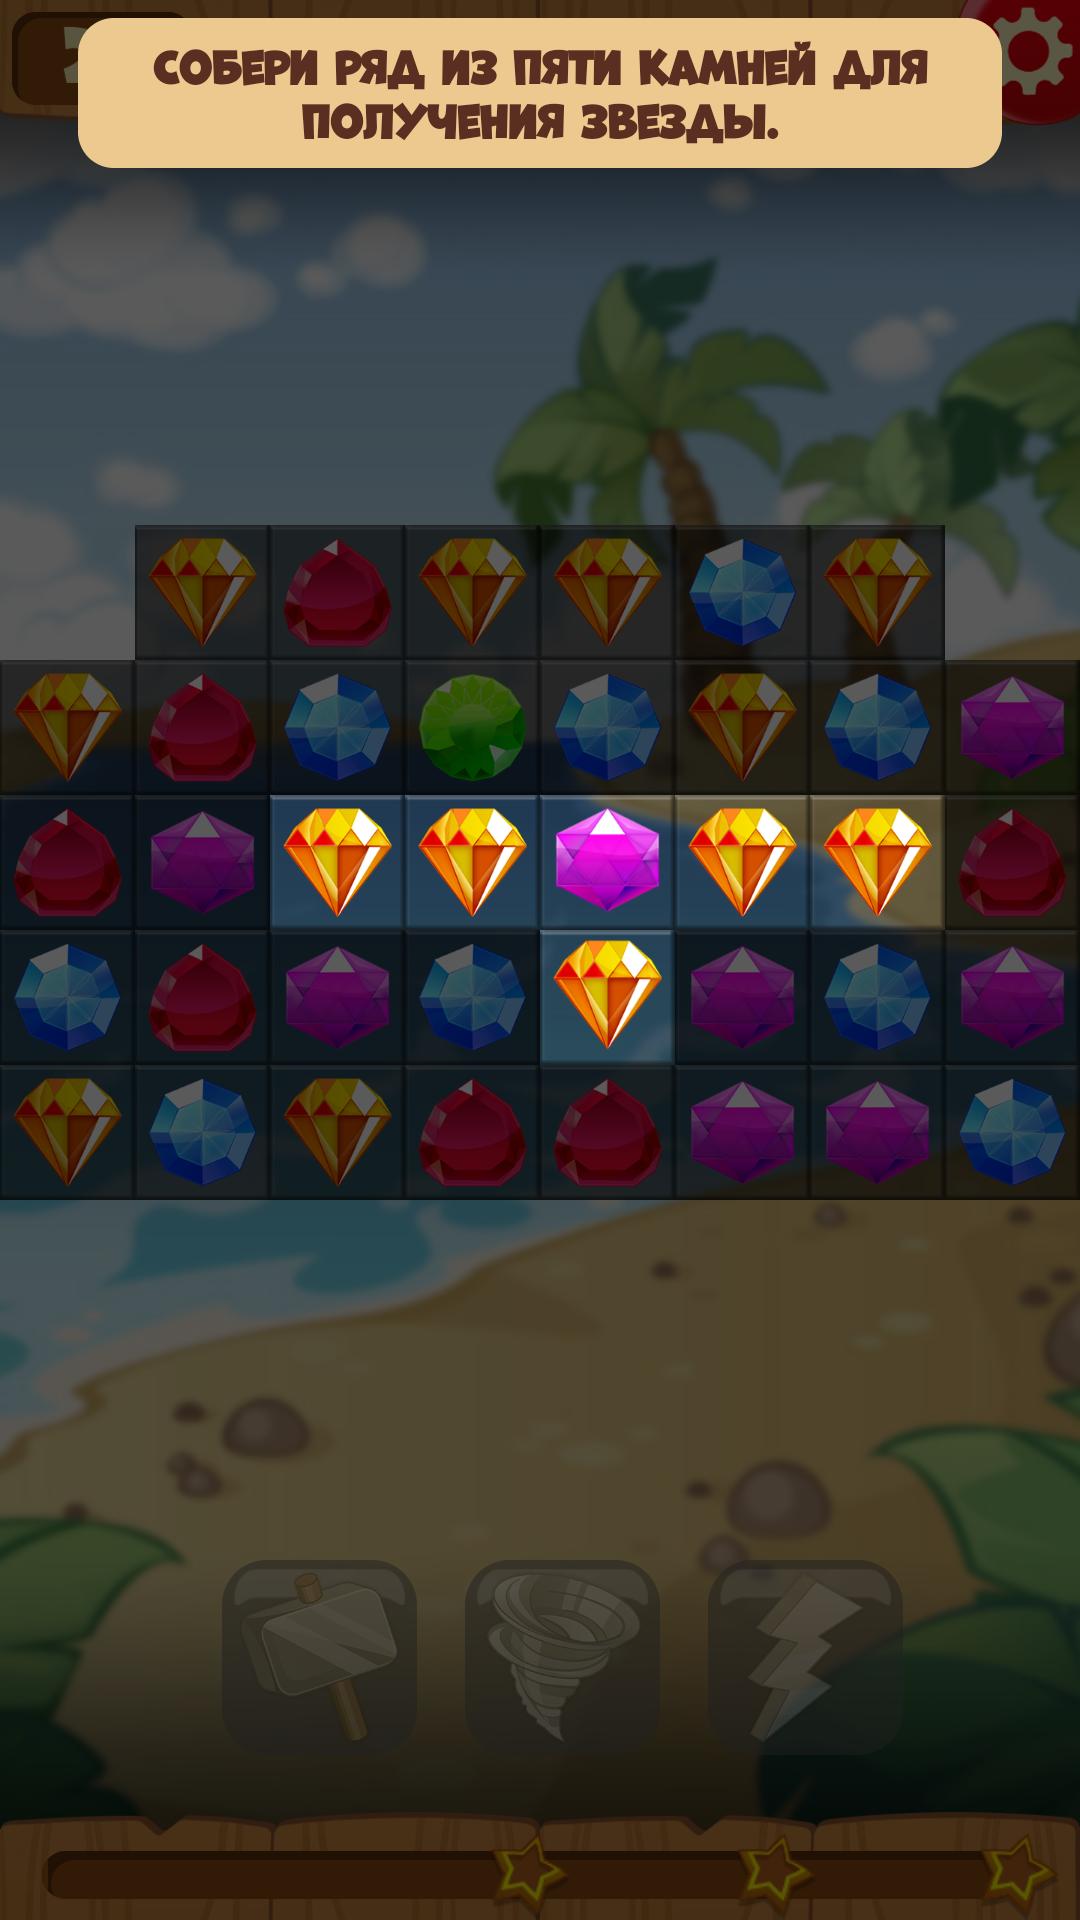 Casino cristal отзывы